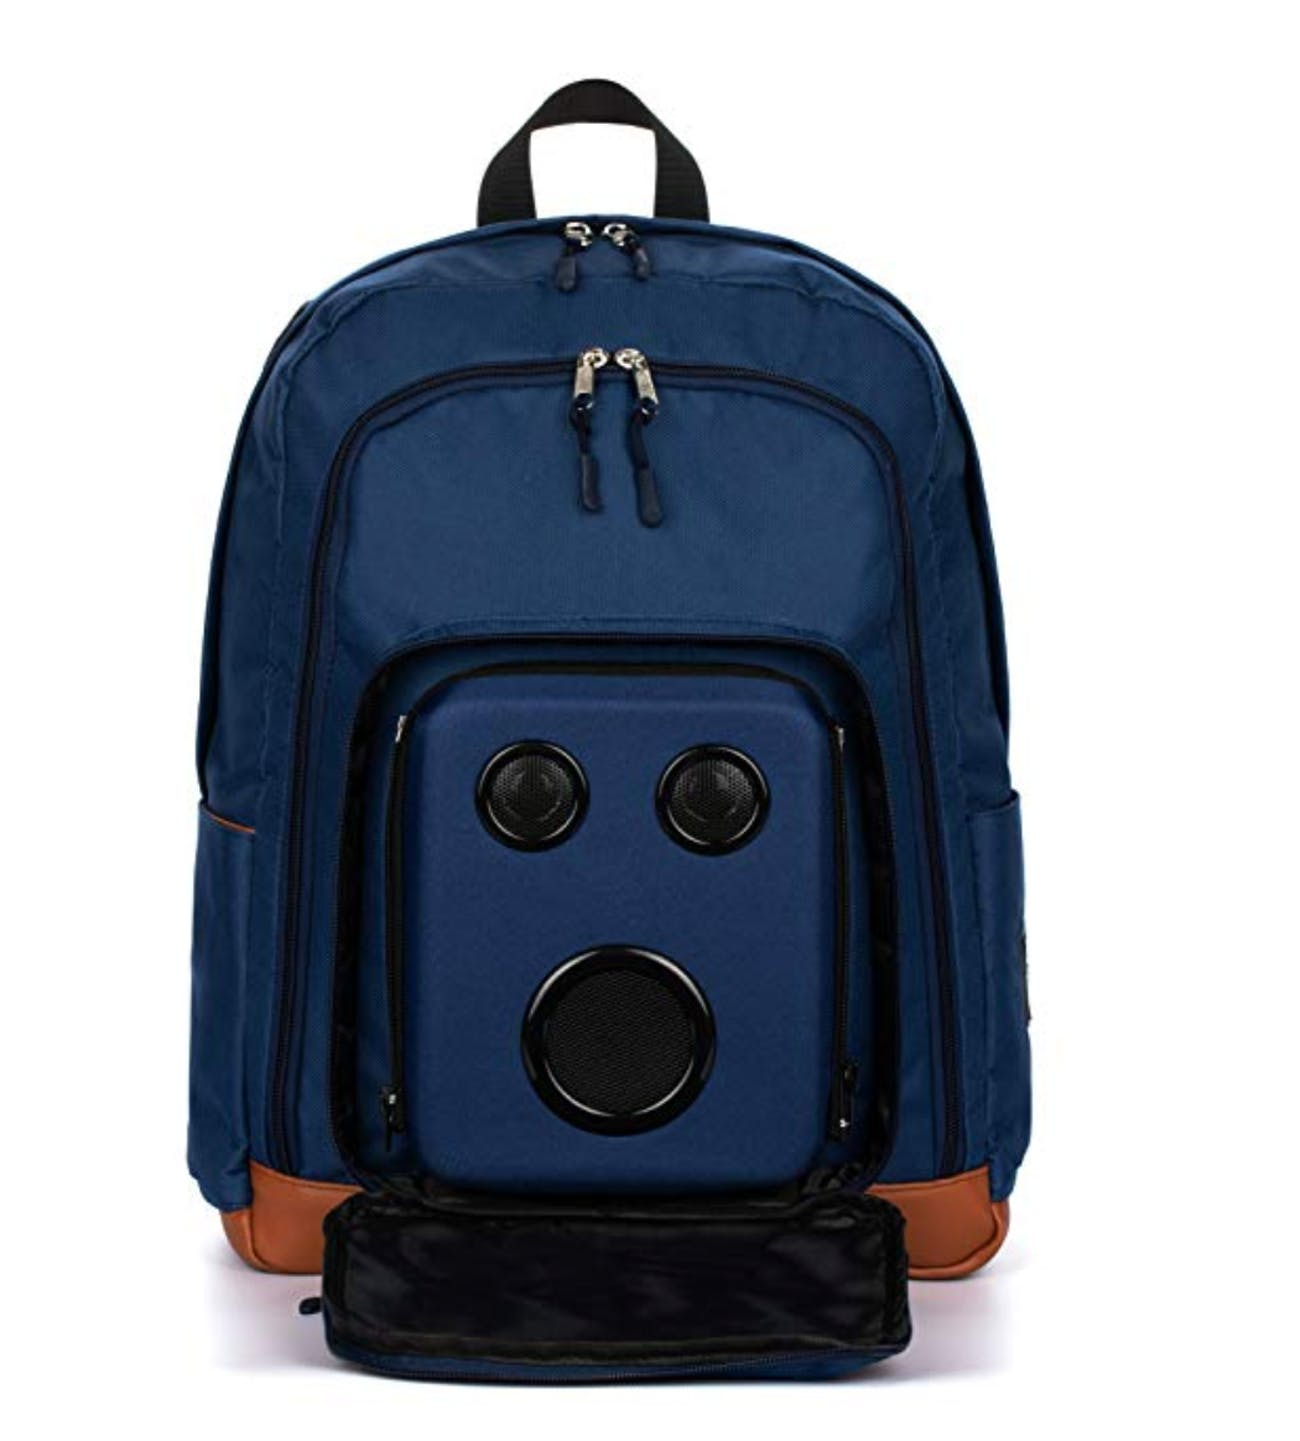 music, backpacks, technology, speakers, bluetooth, travel